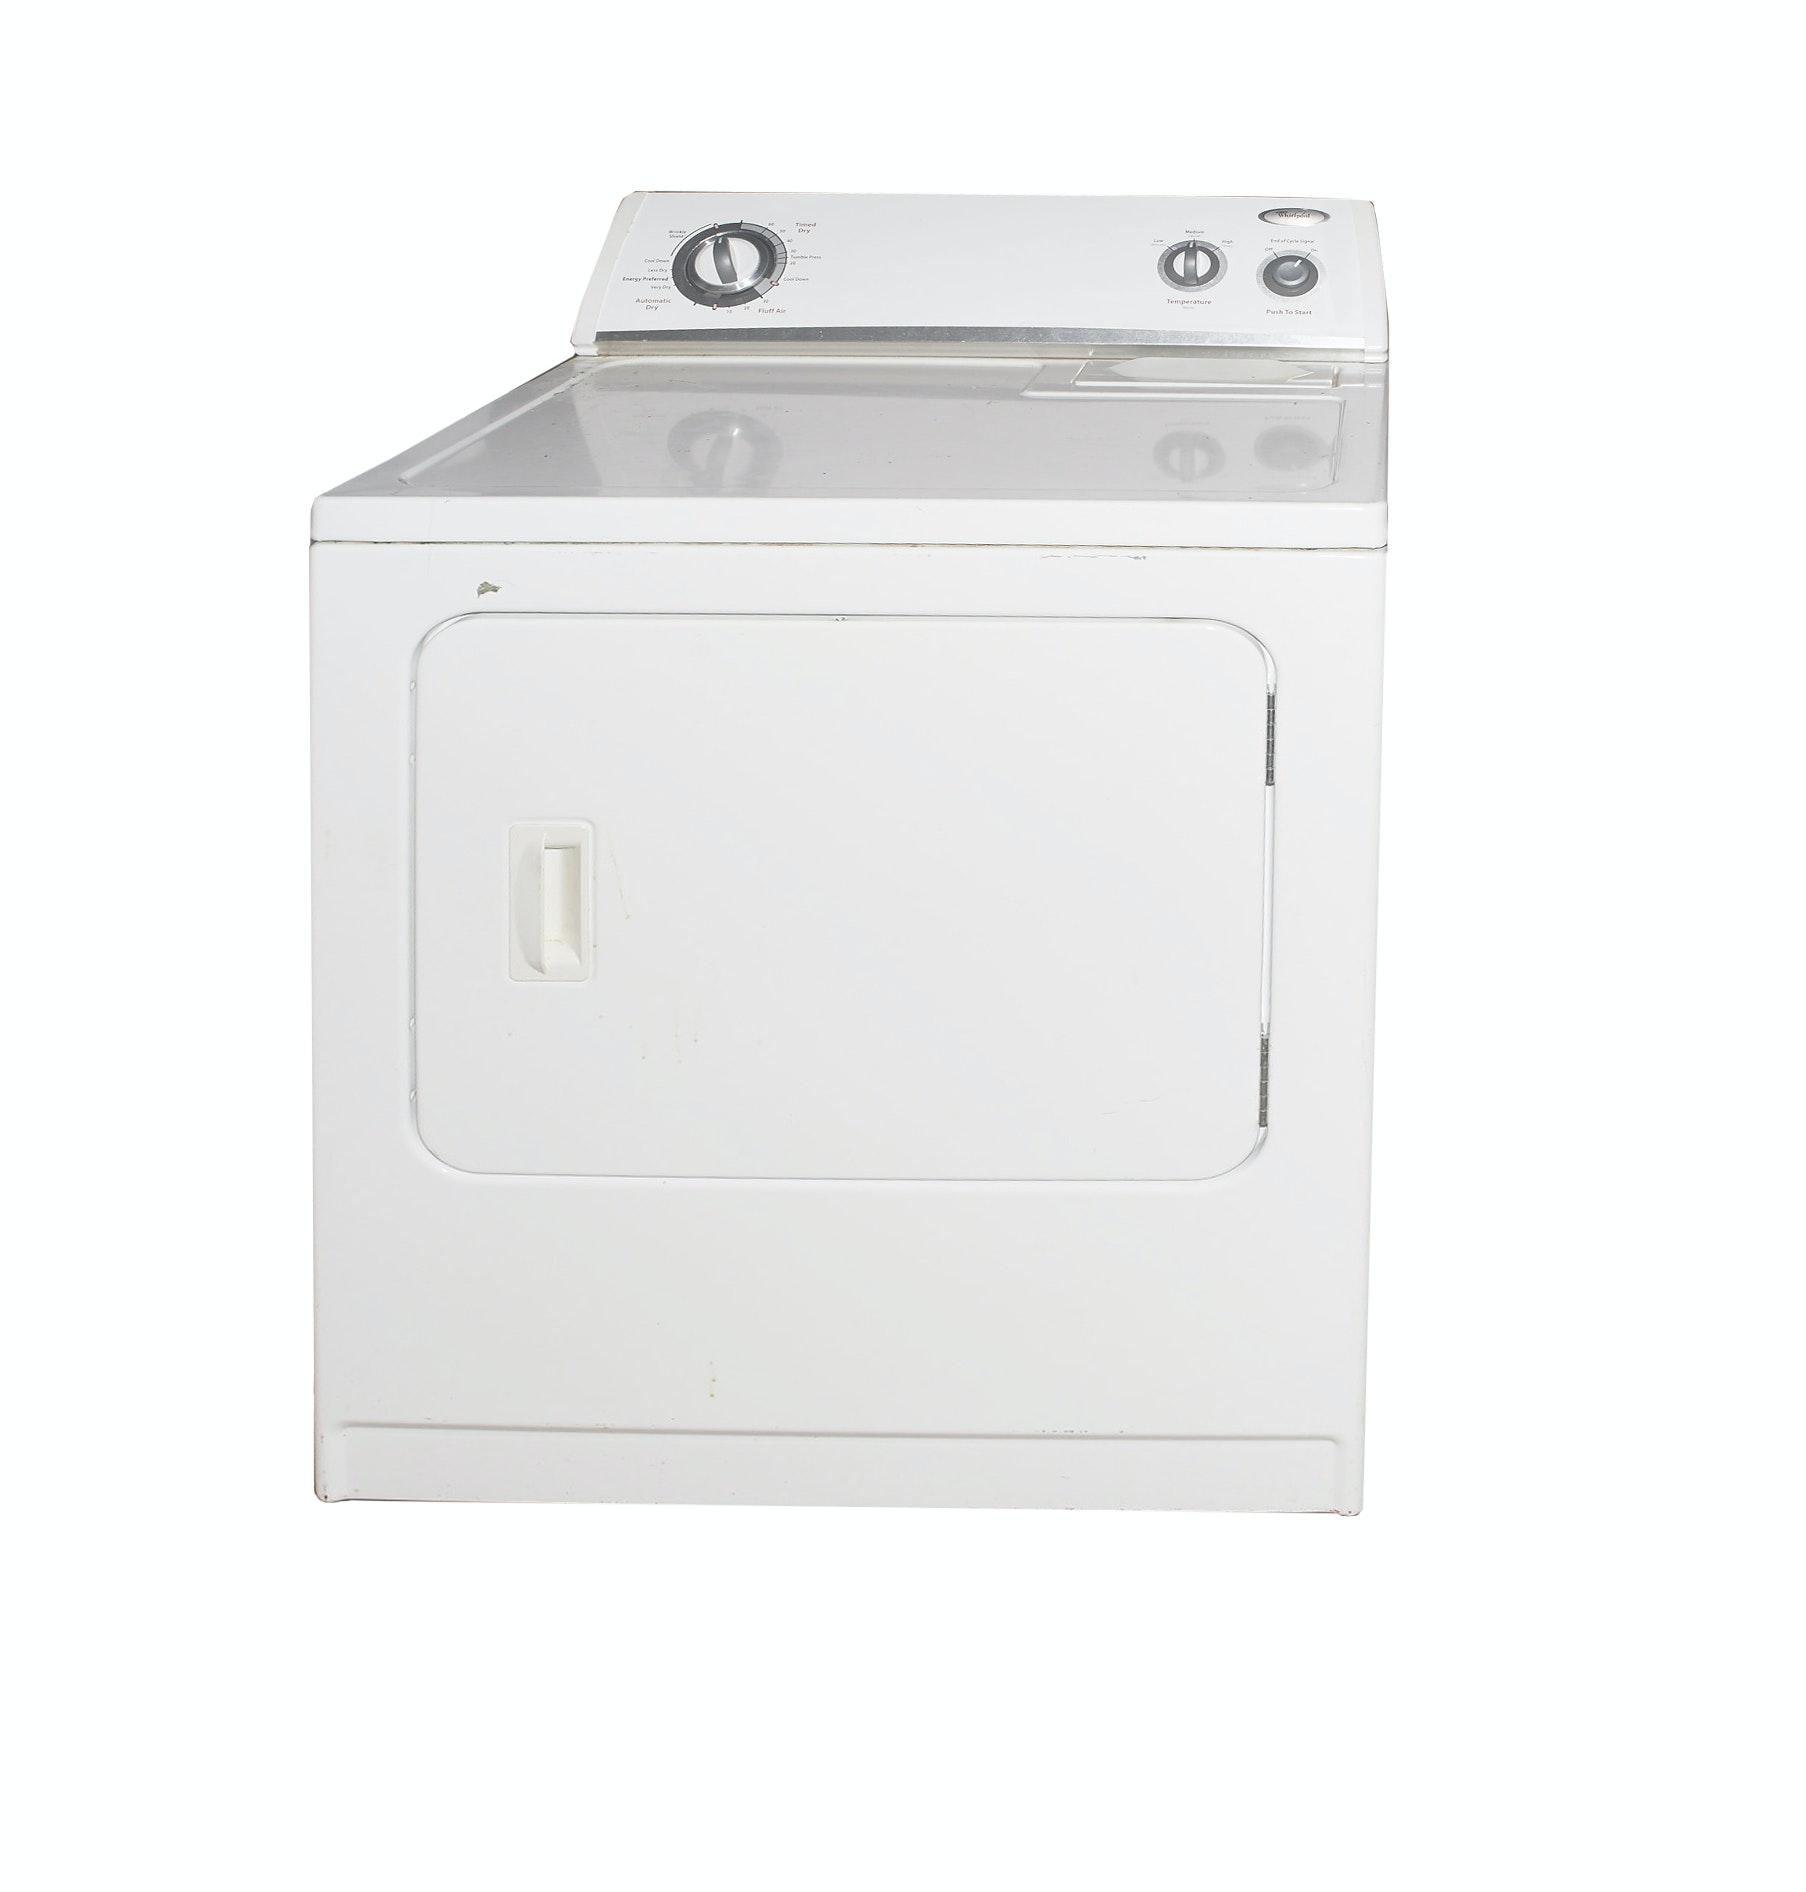 lg washing machine model wt4870cw